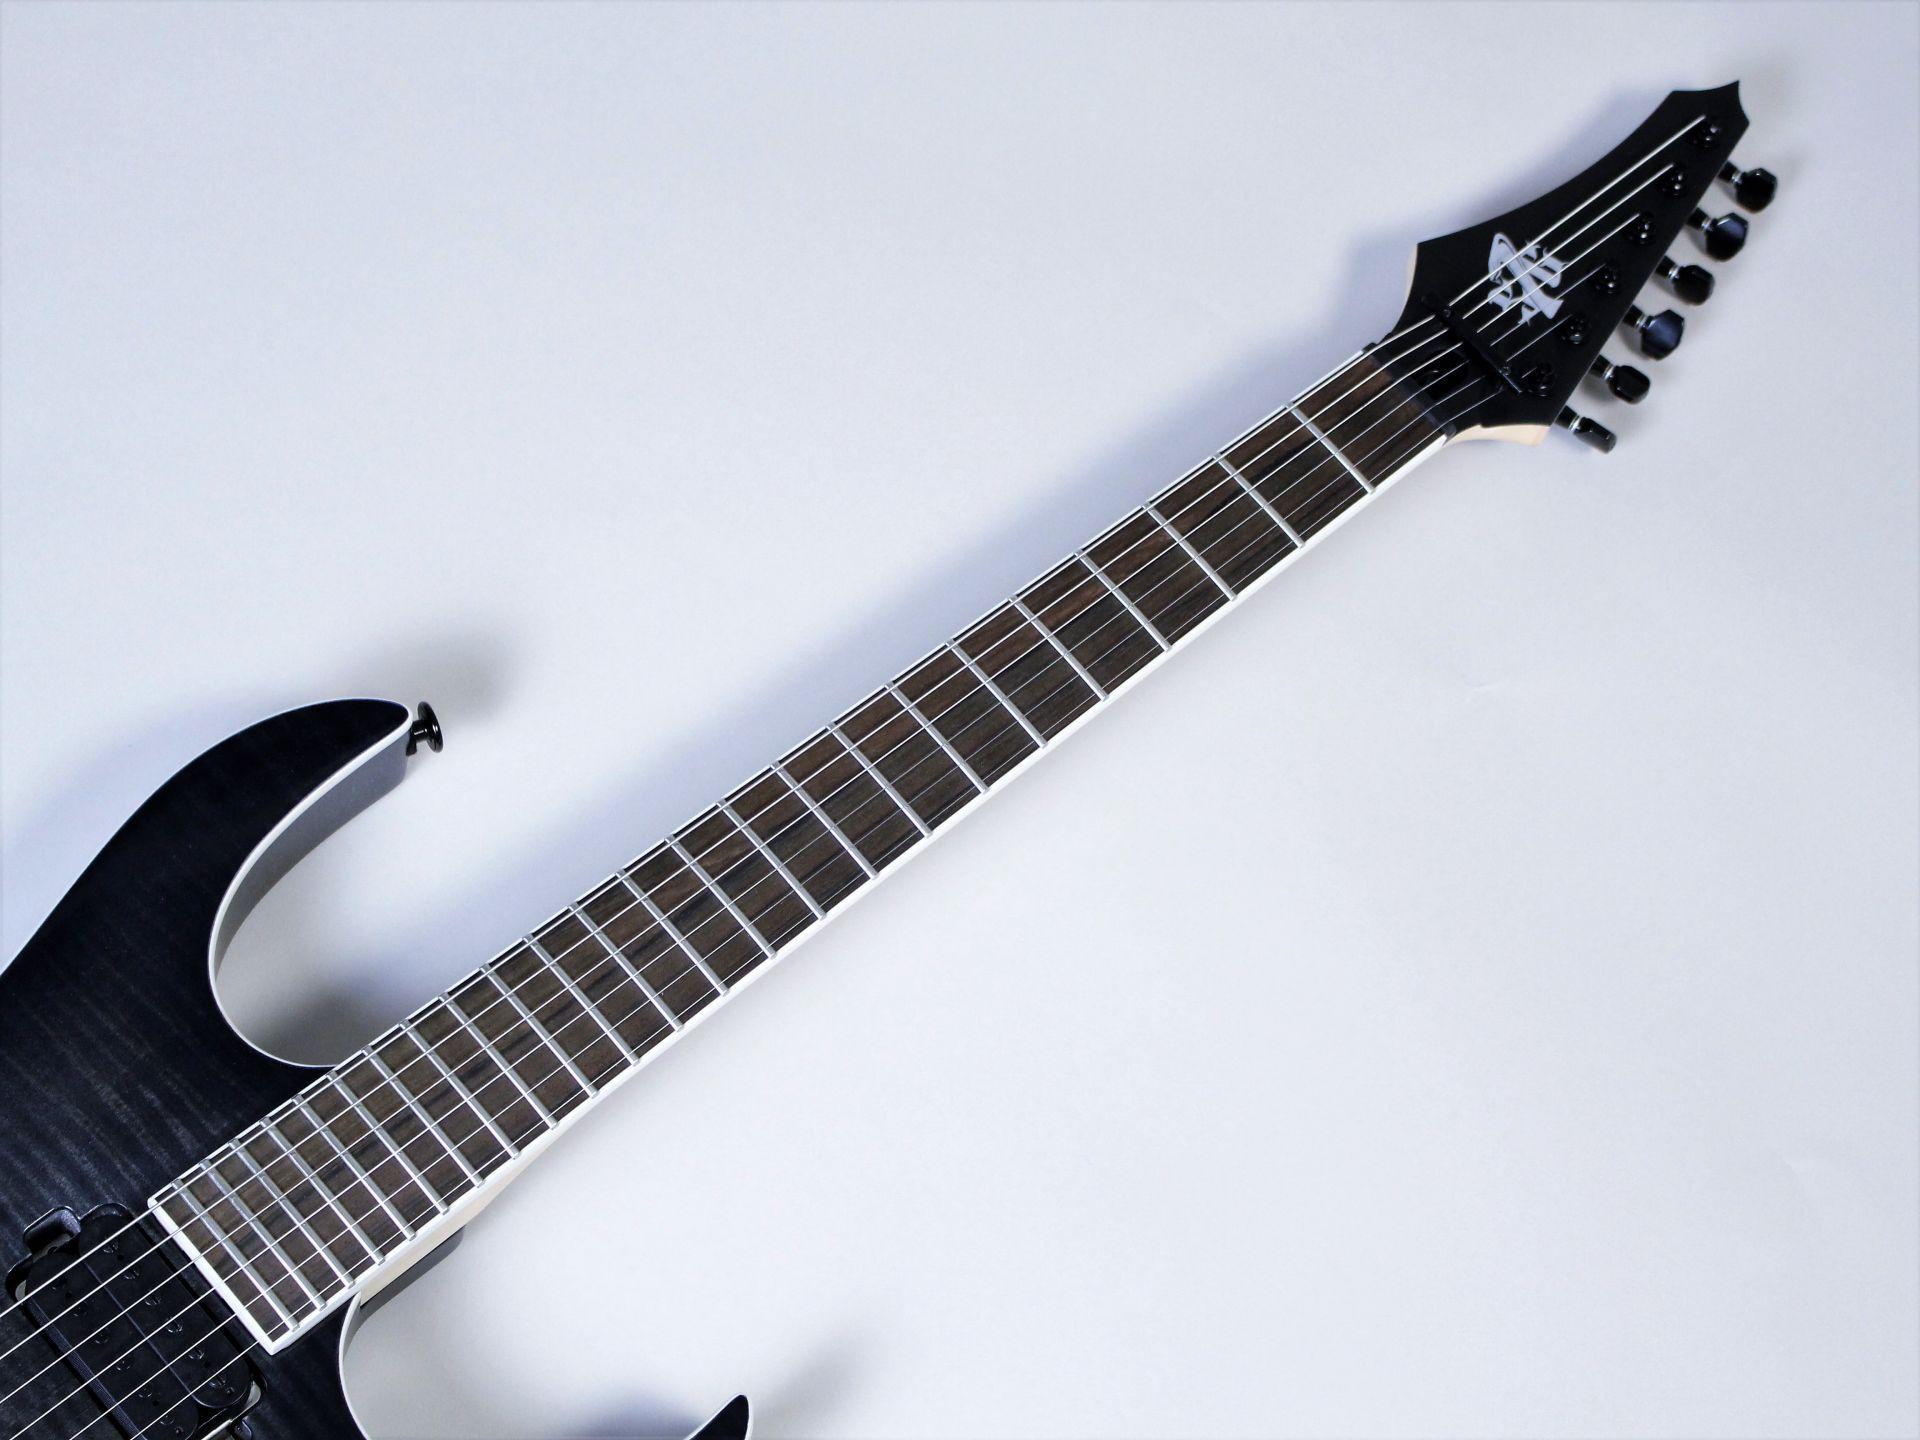 Strictly 7 Guitars – Cobra JS6 FM BBG【6本限定モデル】【4月28日発売・予約受付中】の全体画像(縦)